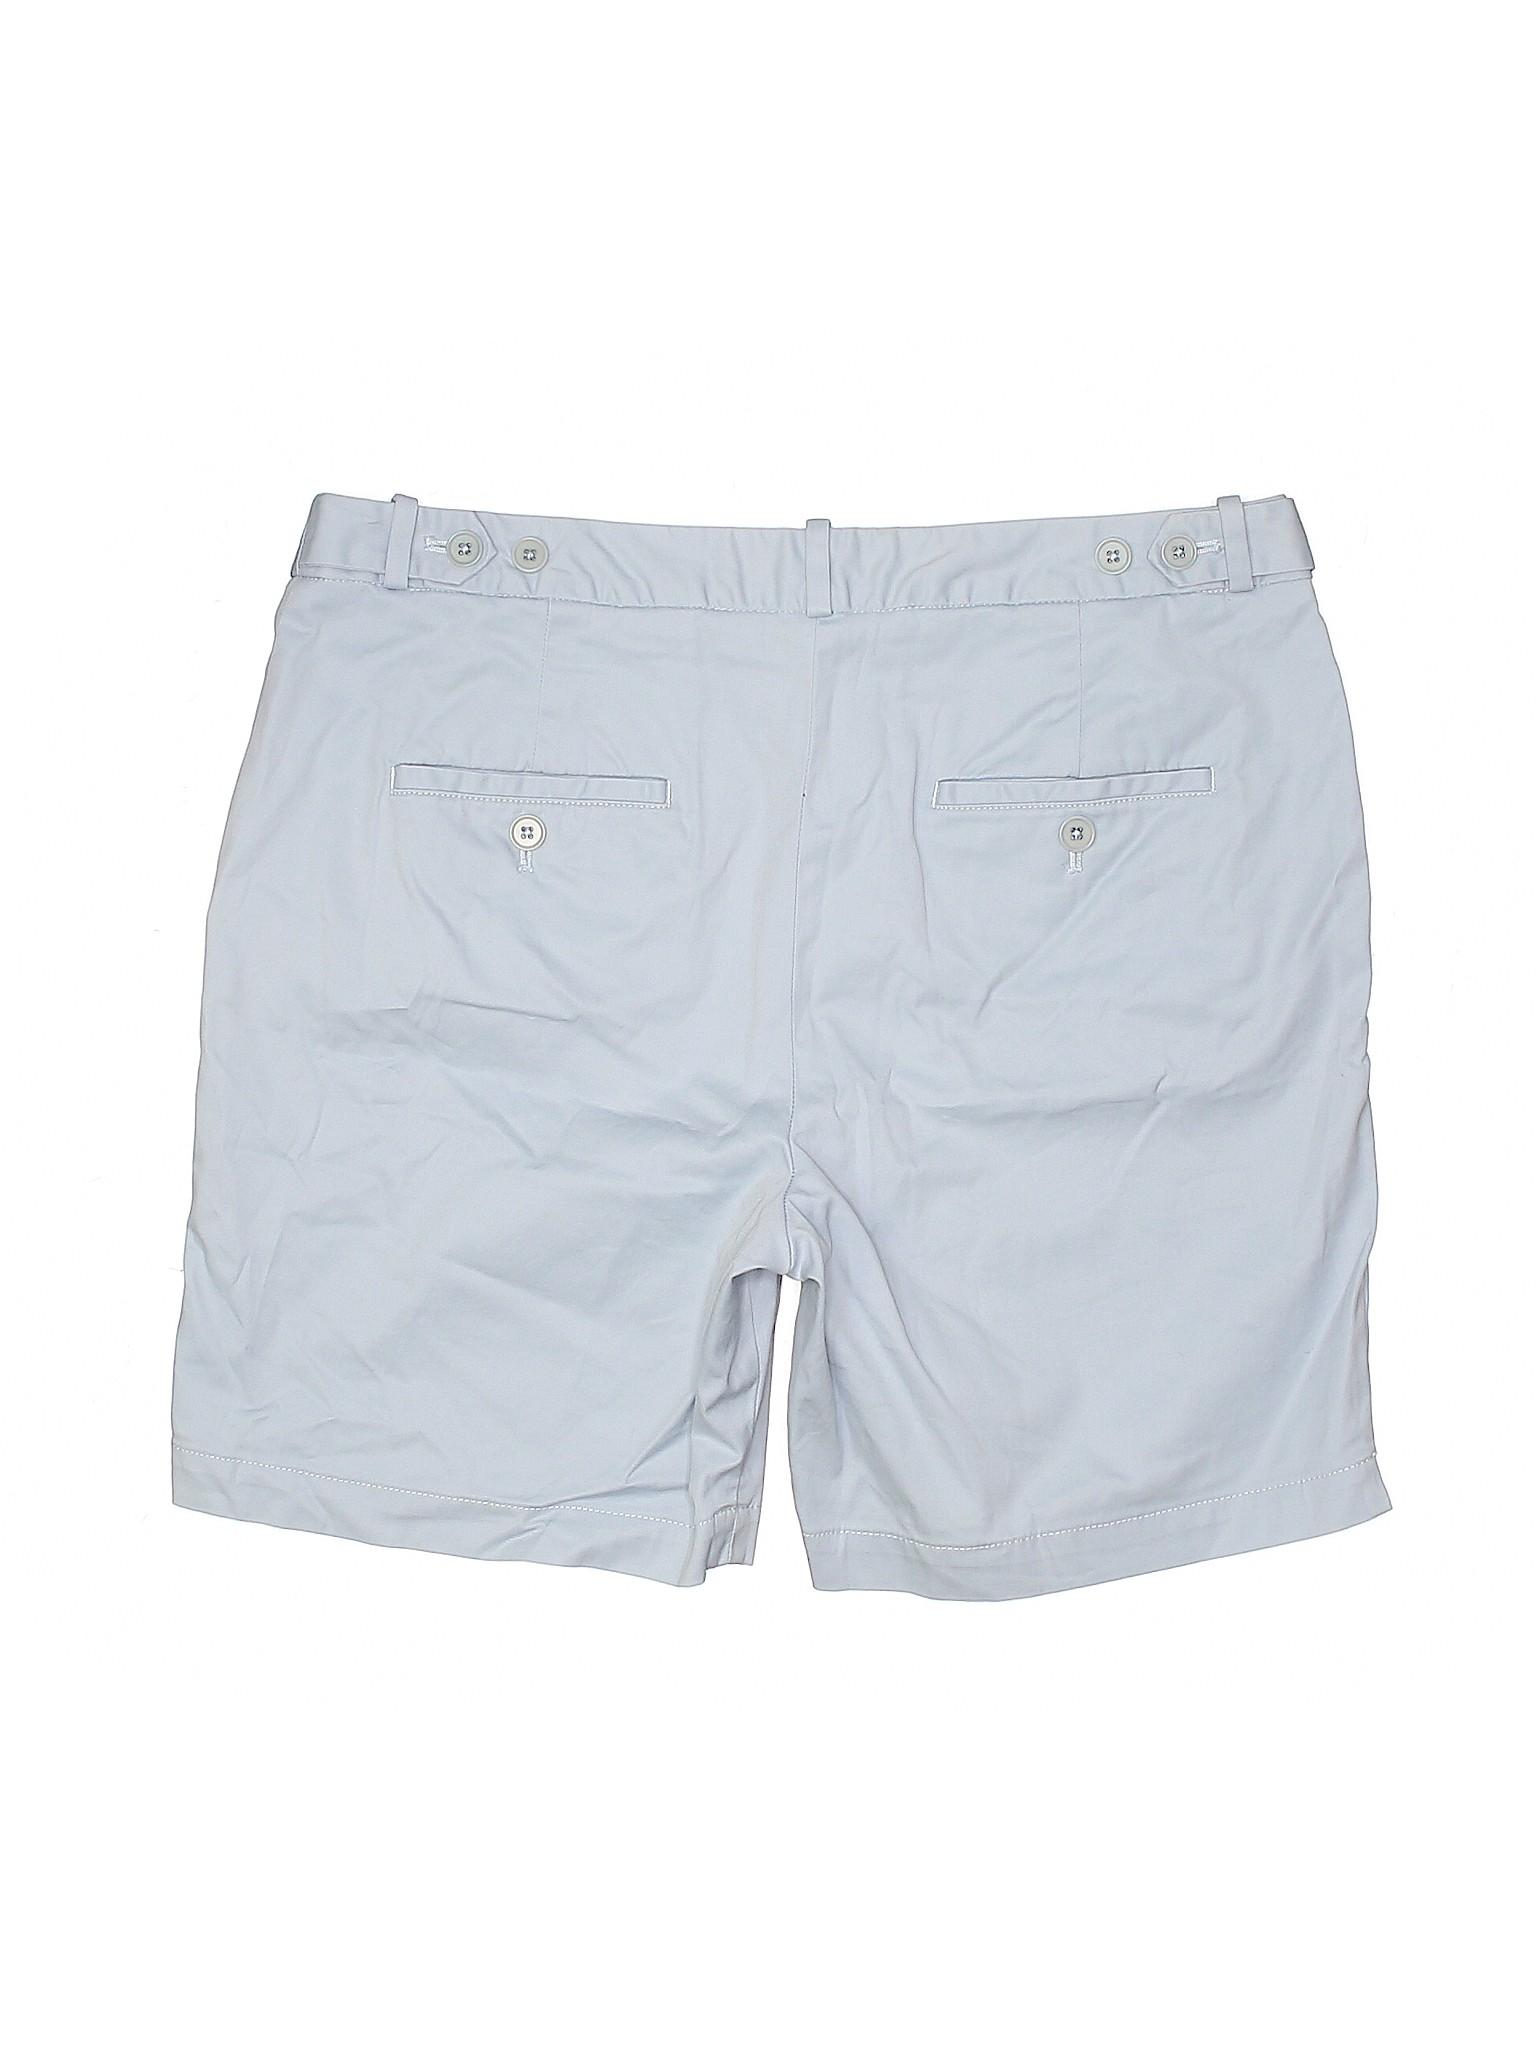 Boutique Khaki Shorts leisure Talbots Boutique leisure Talbots Khaki n8U4fwr1n